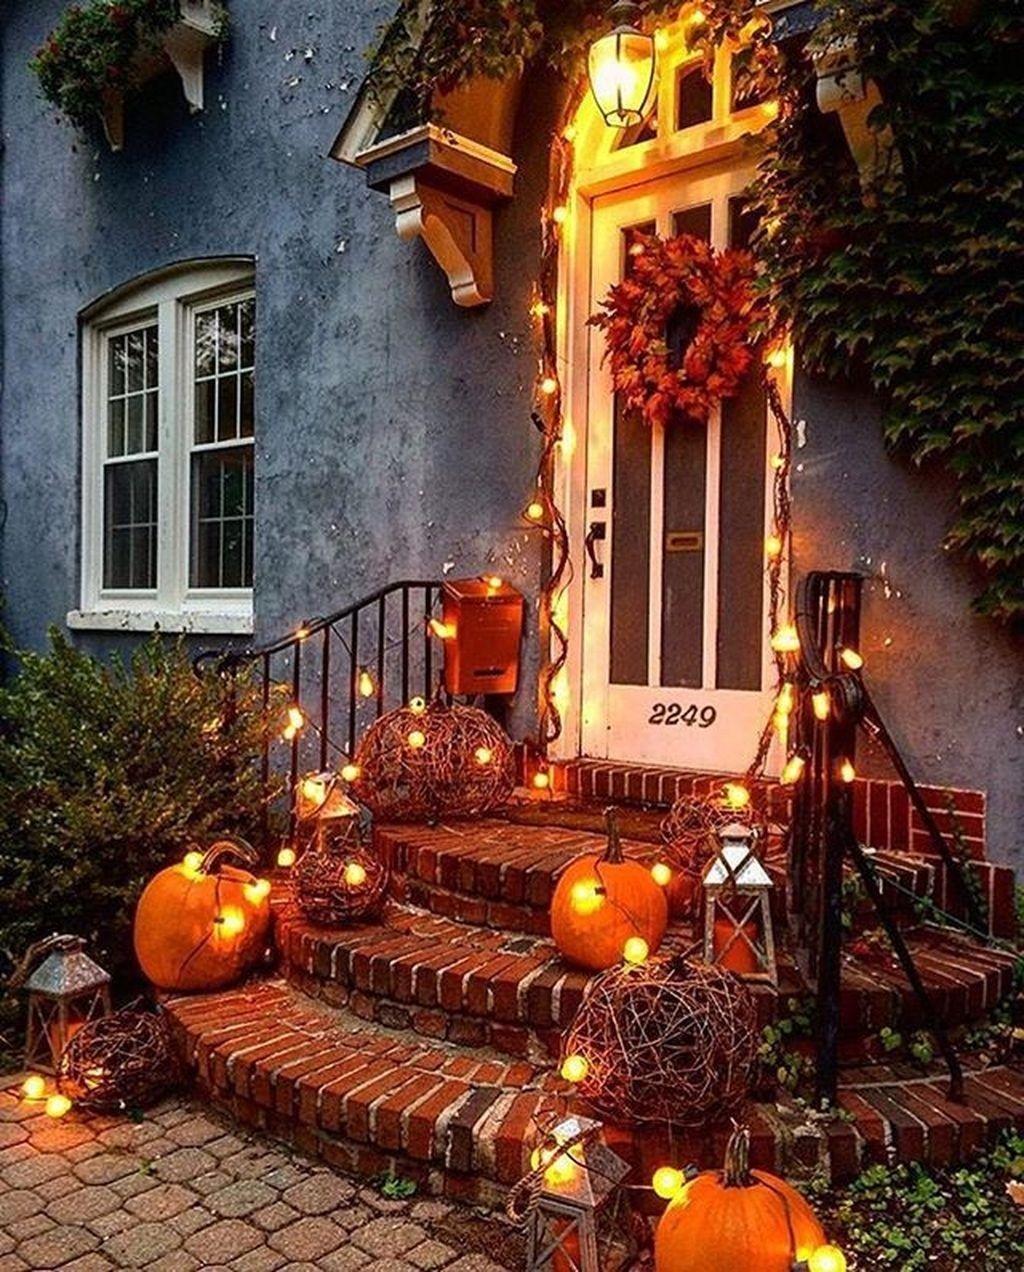 48 Amazing Outdoor Fall Decor Ideas That Will Fascinate You #falldecor